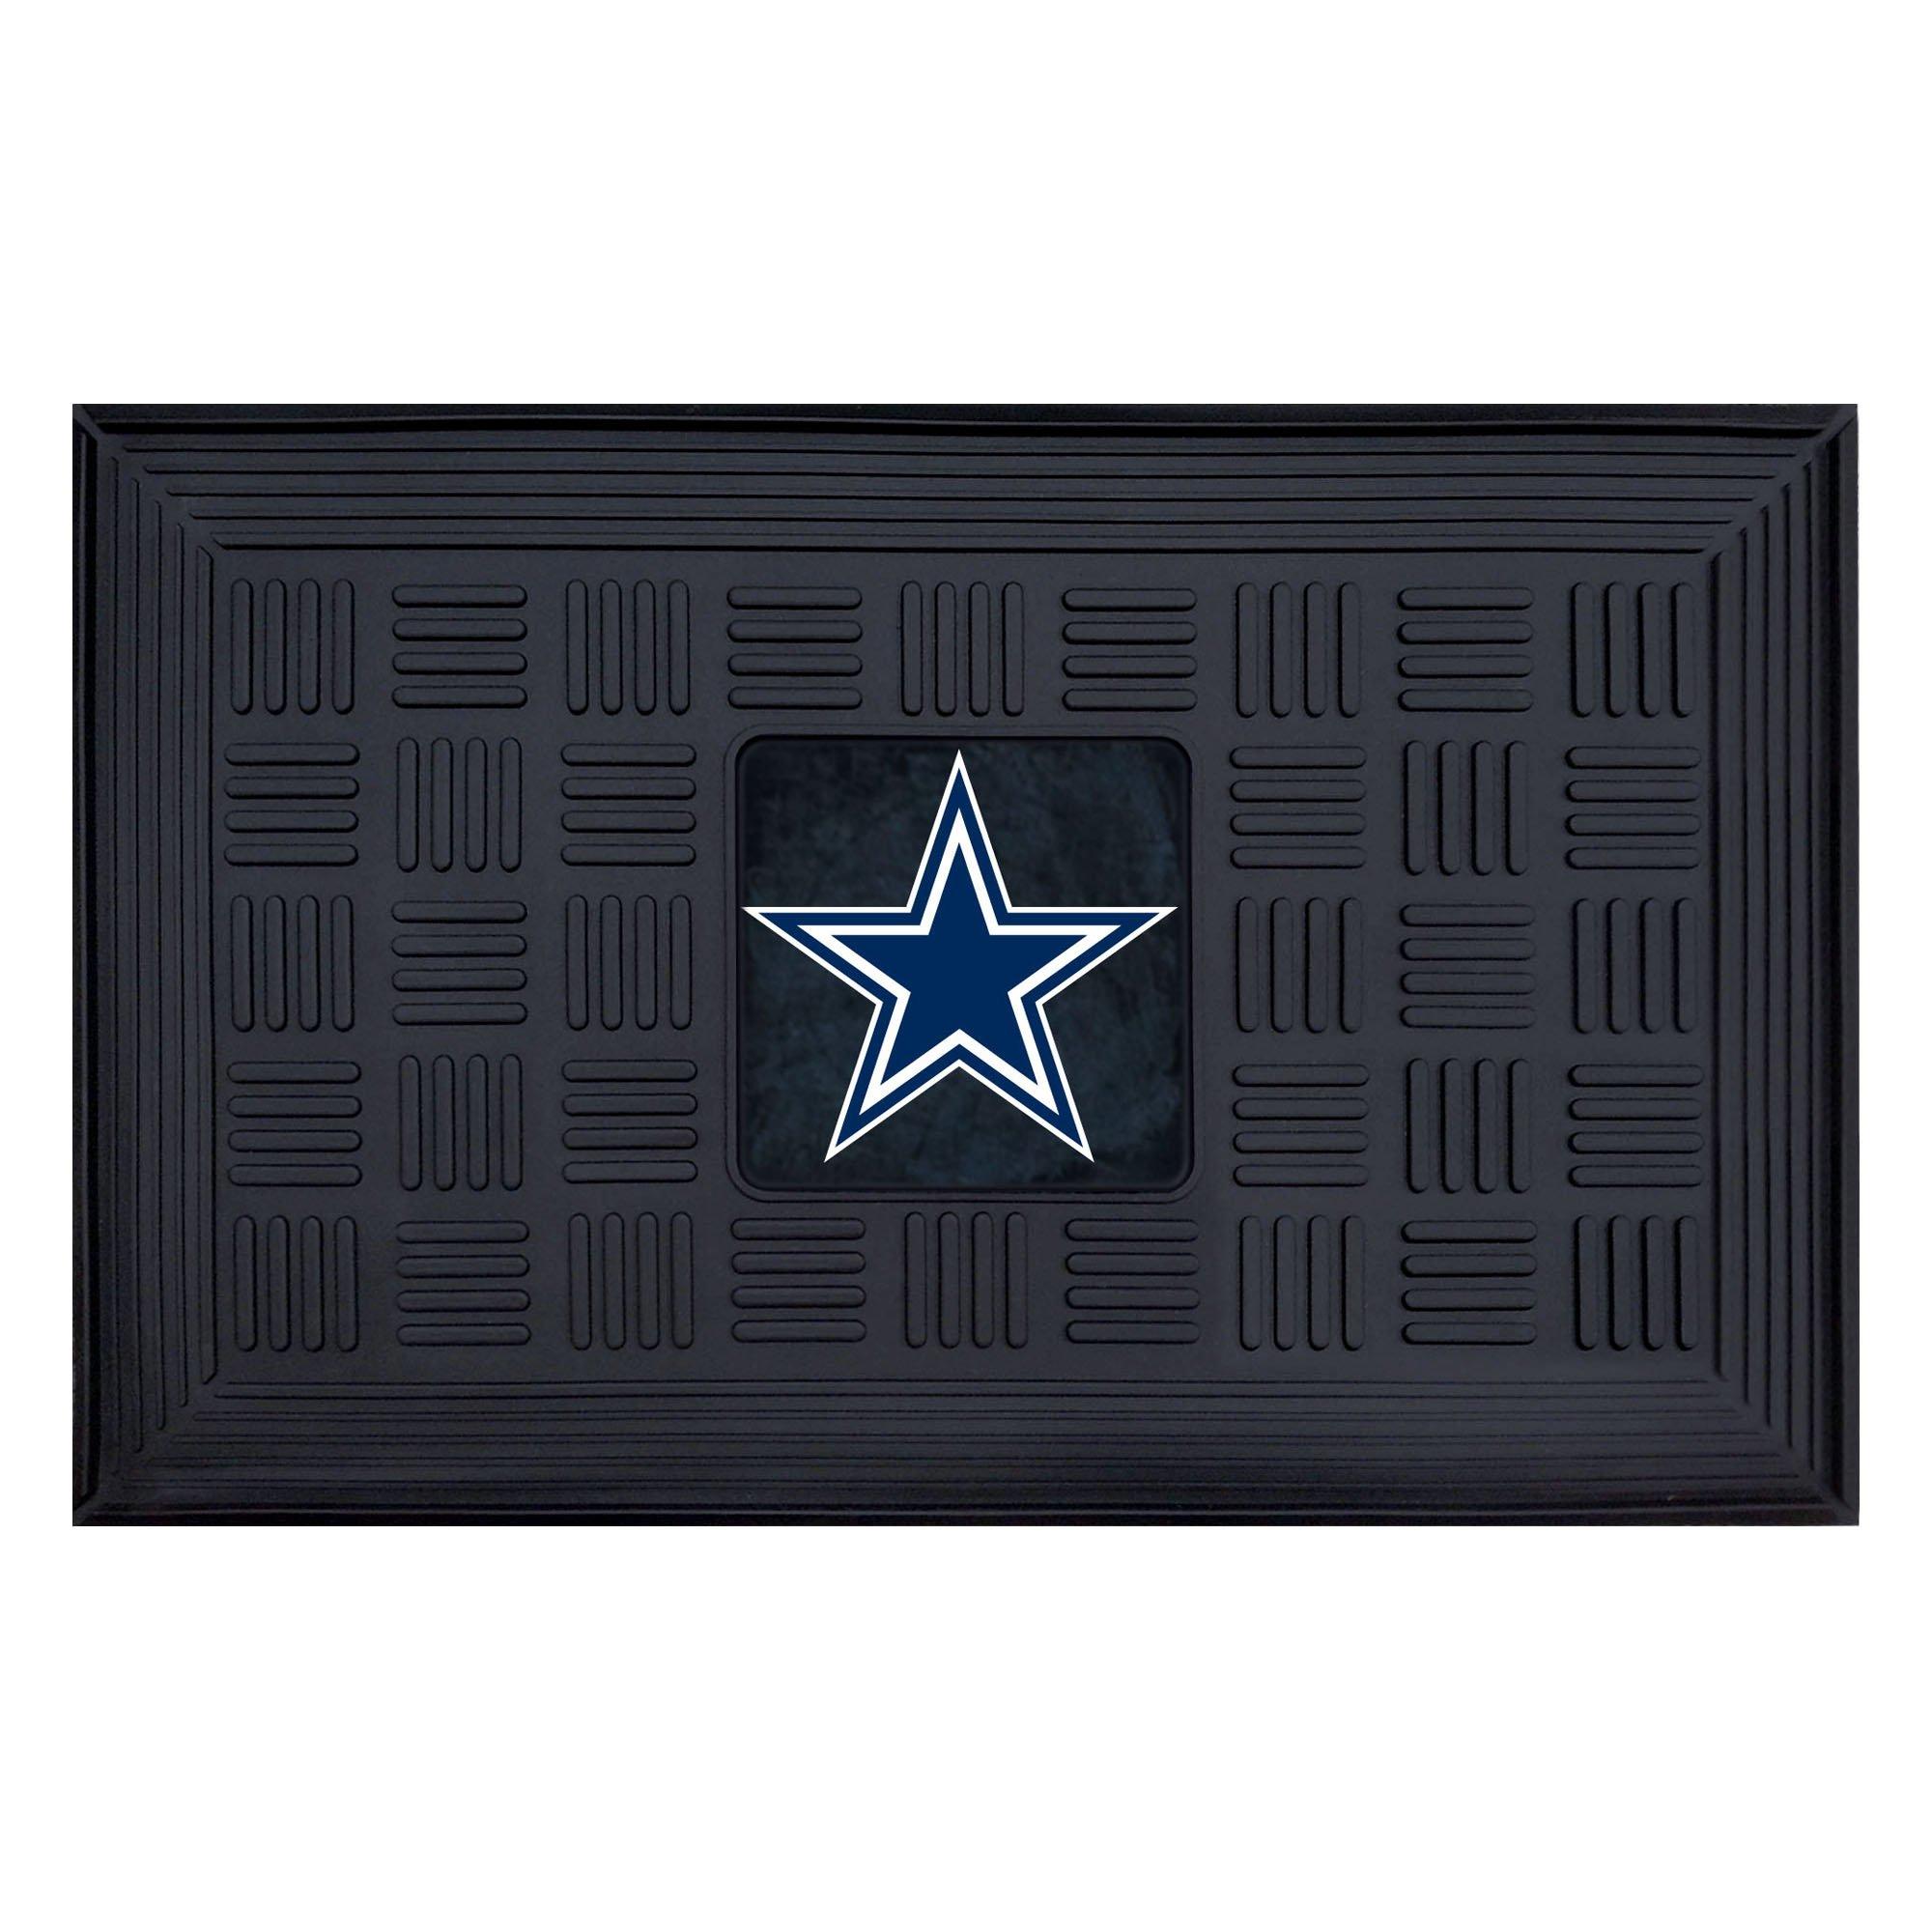 Dallas Cowboys Decor: Amazon.com